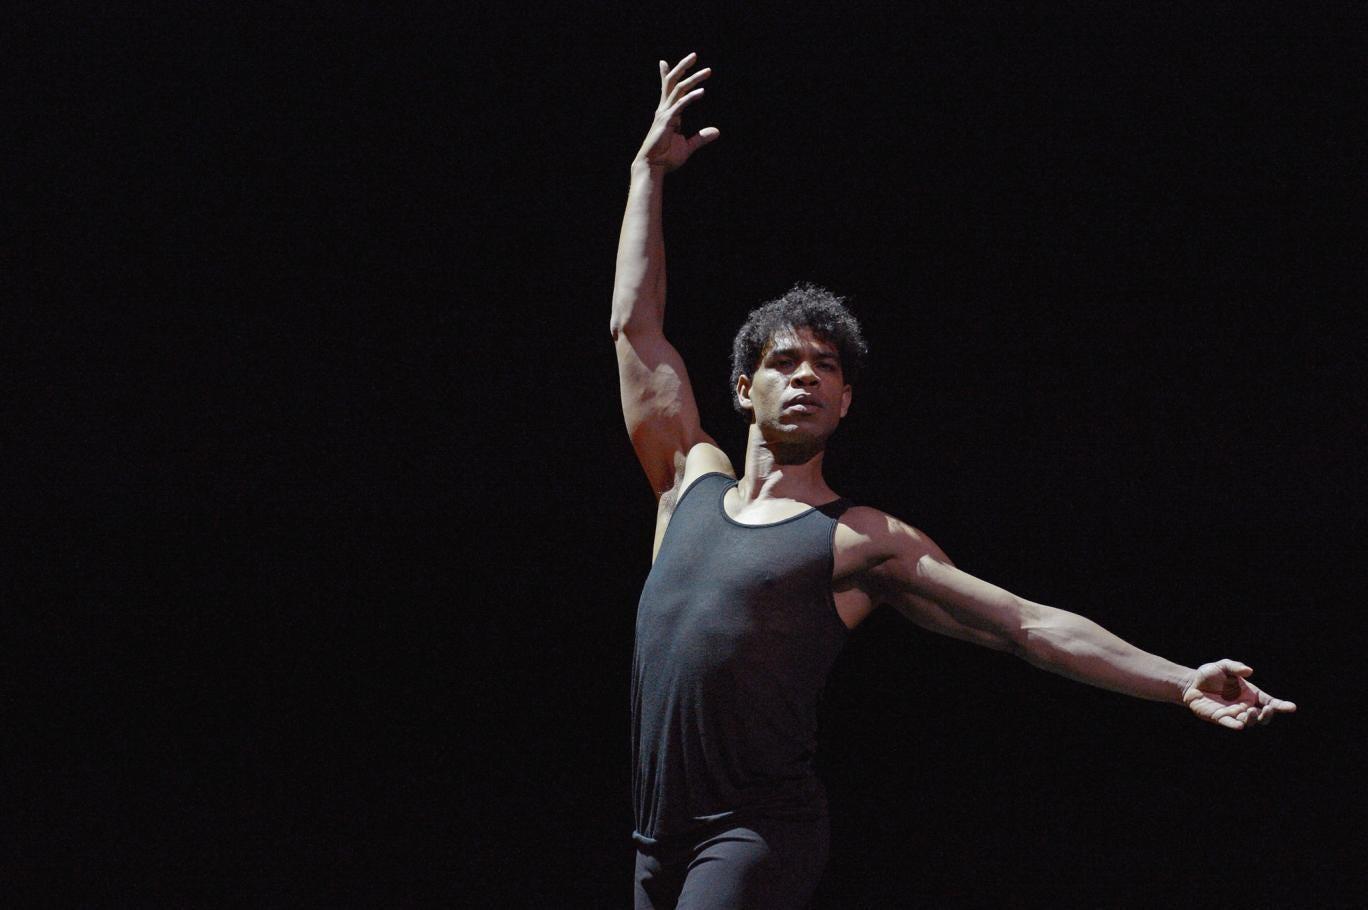 Involving sagas: Superstar dancer-writer-actor Carlos Acosta